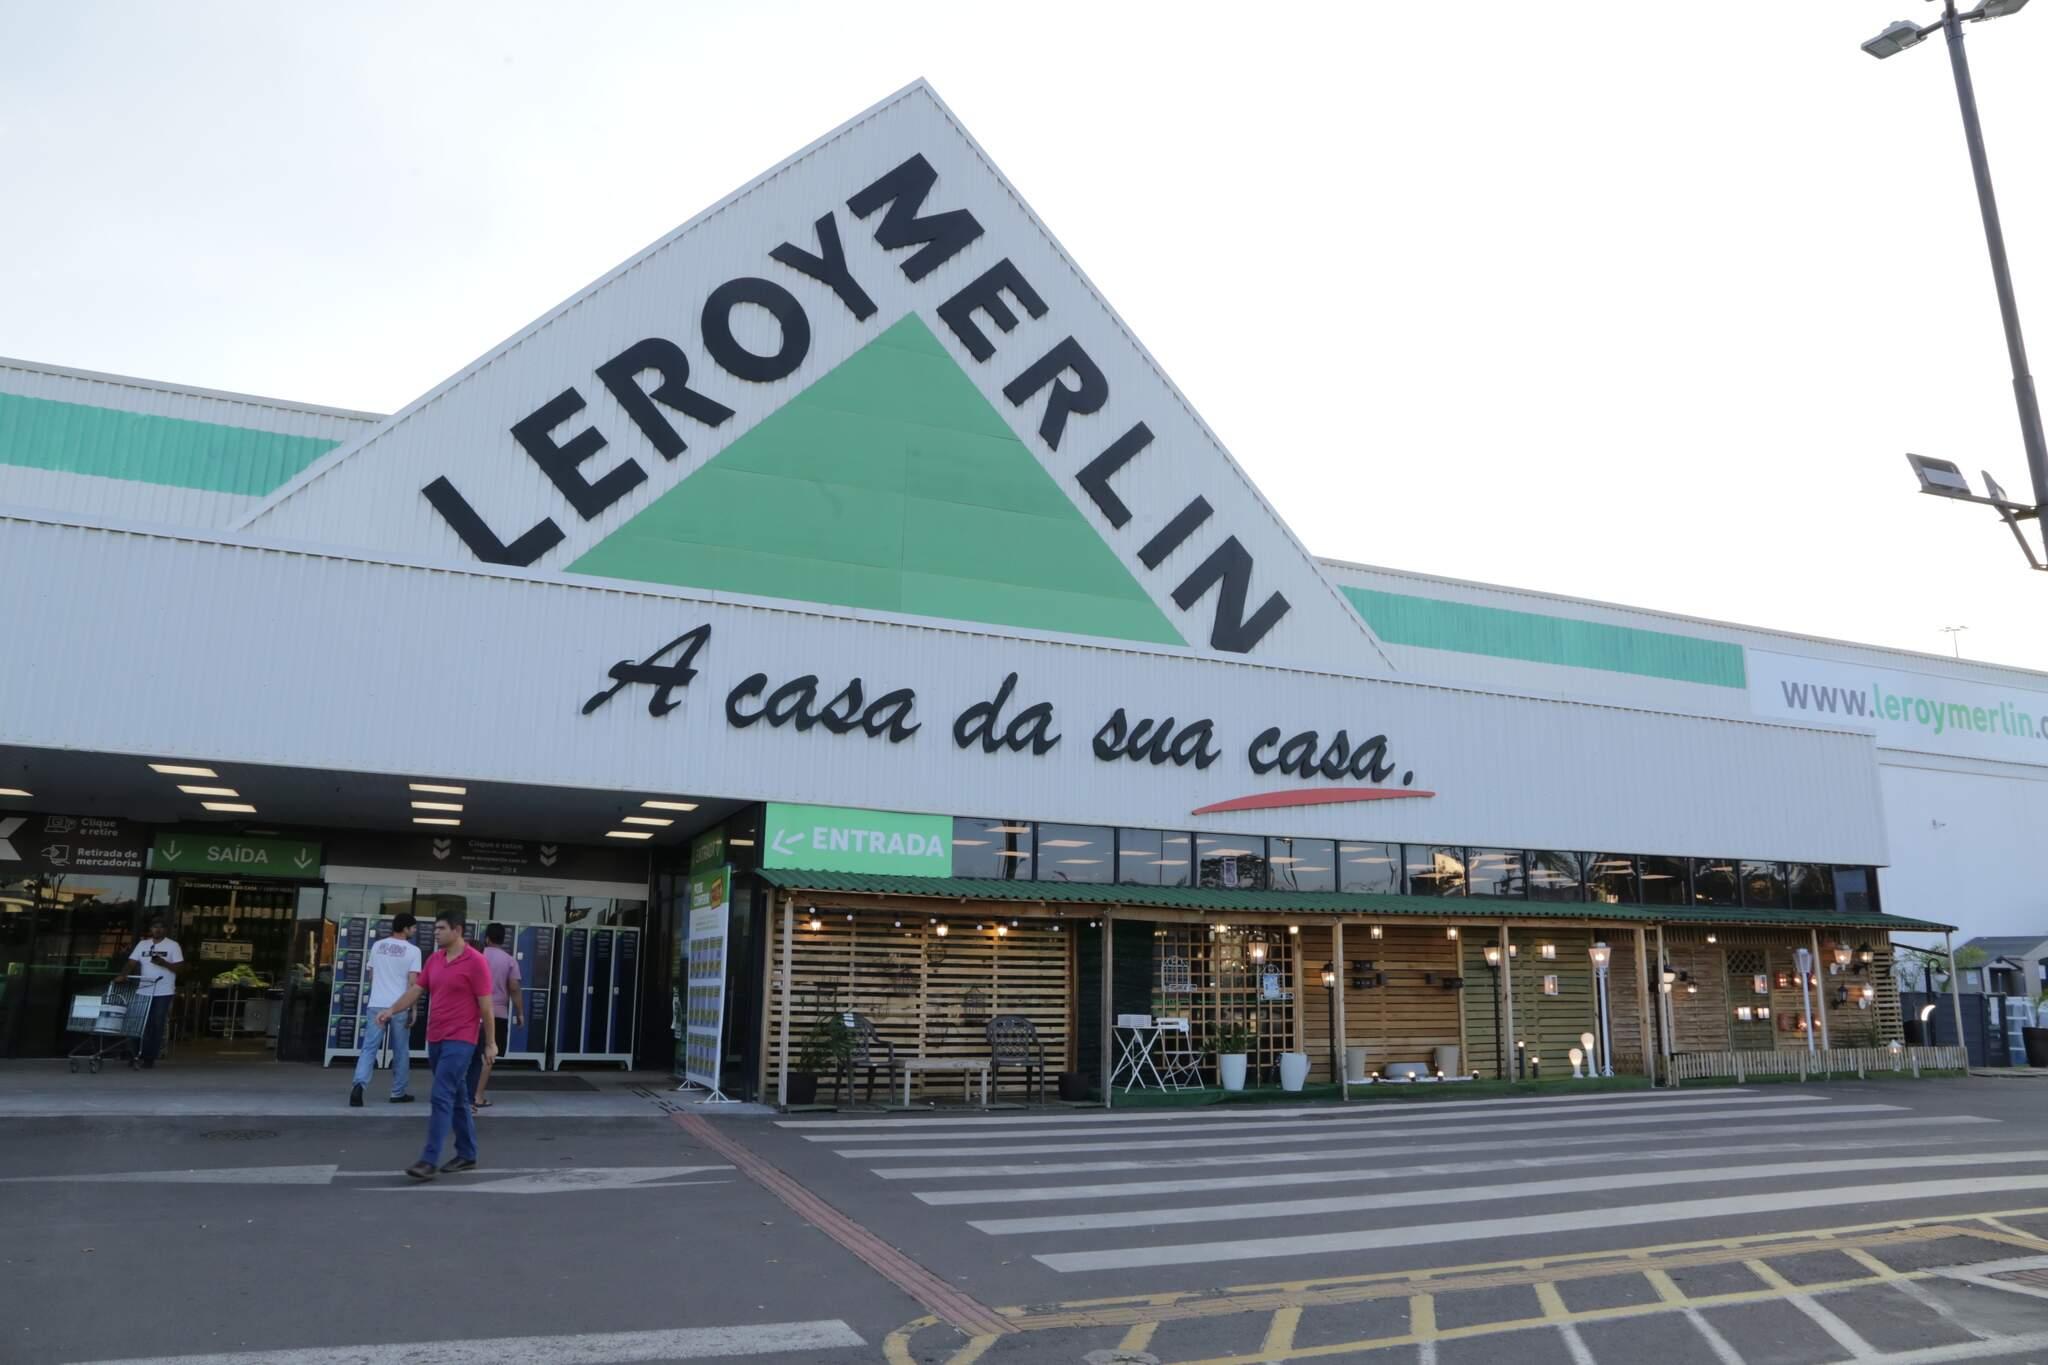 A Leroy Merlin fica na saída para Cuiabá, ao lado do Shopping Bosque dos Ipês. (Foto: Kisie Ainoã)